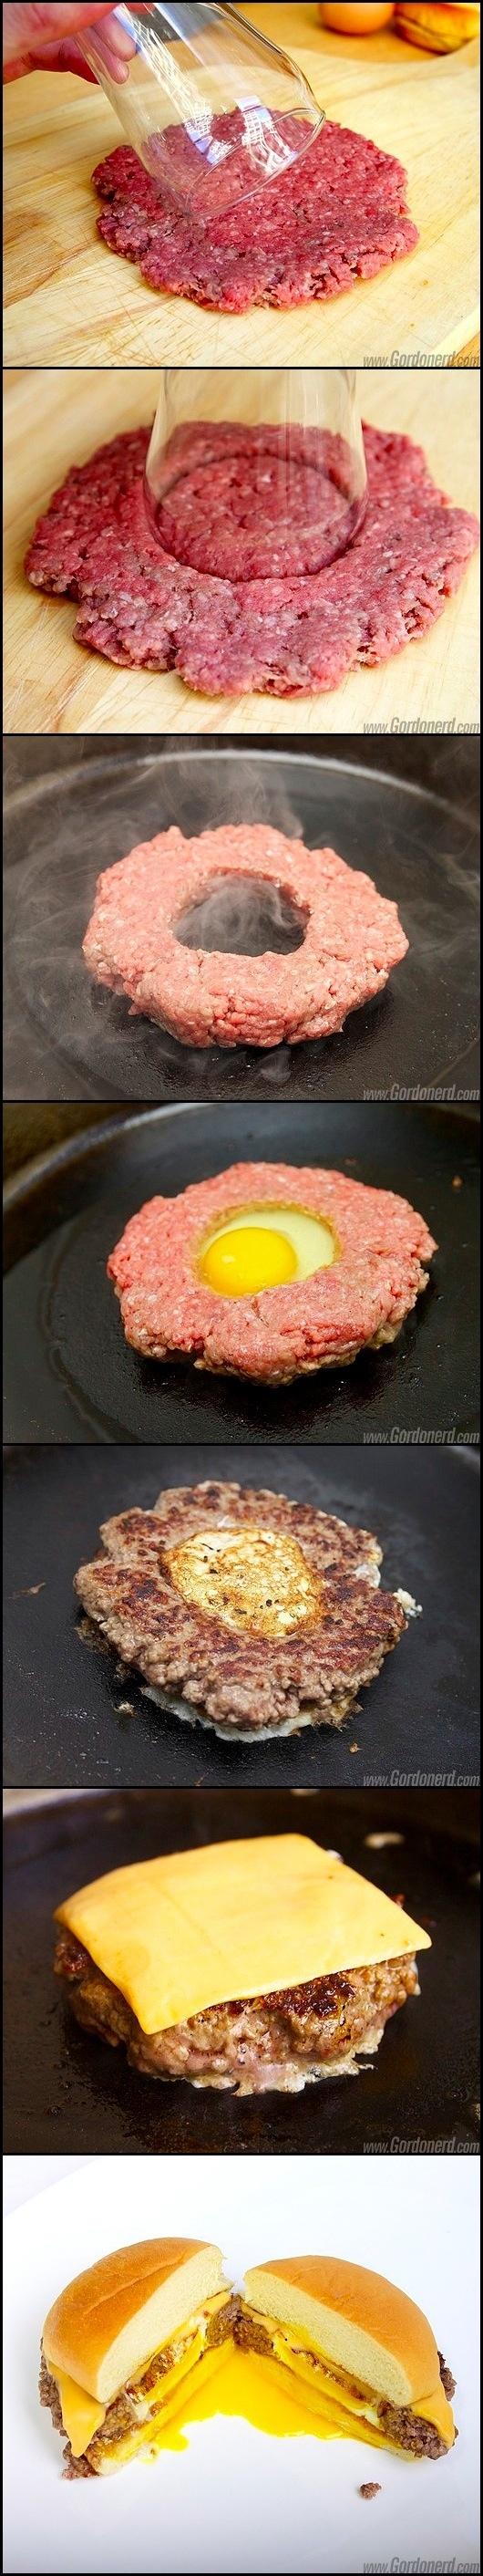 Uf! Mega hamburguesa con huevo!!!